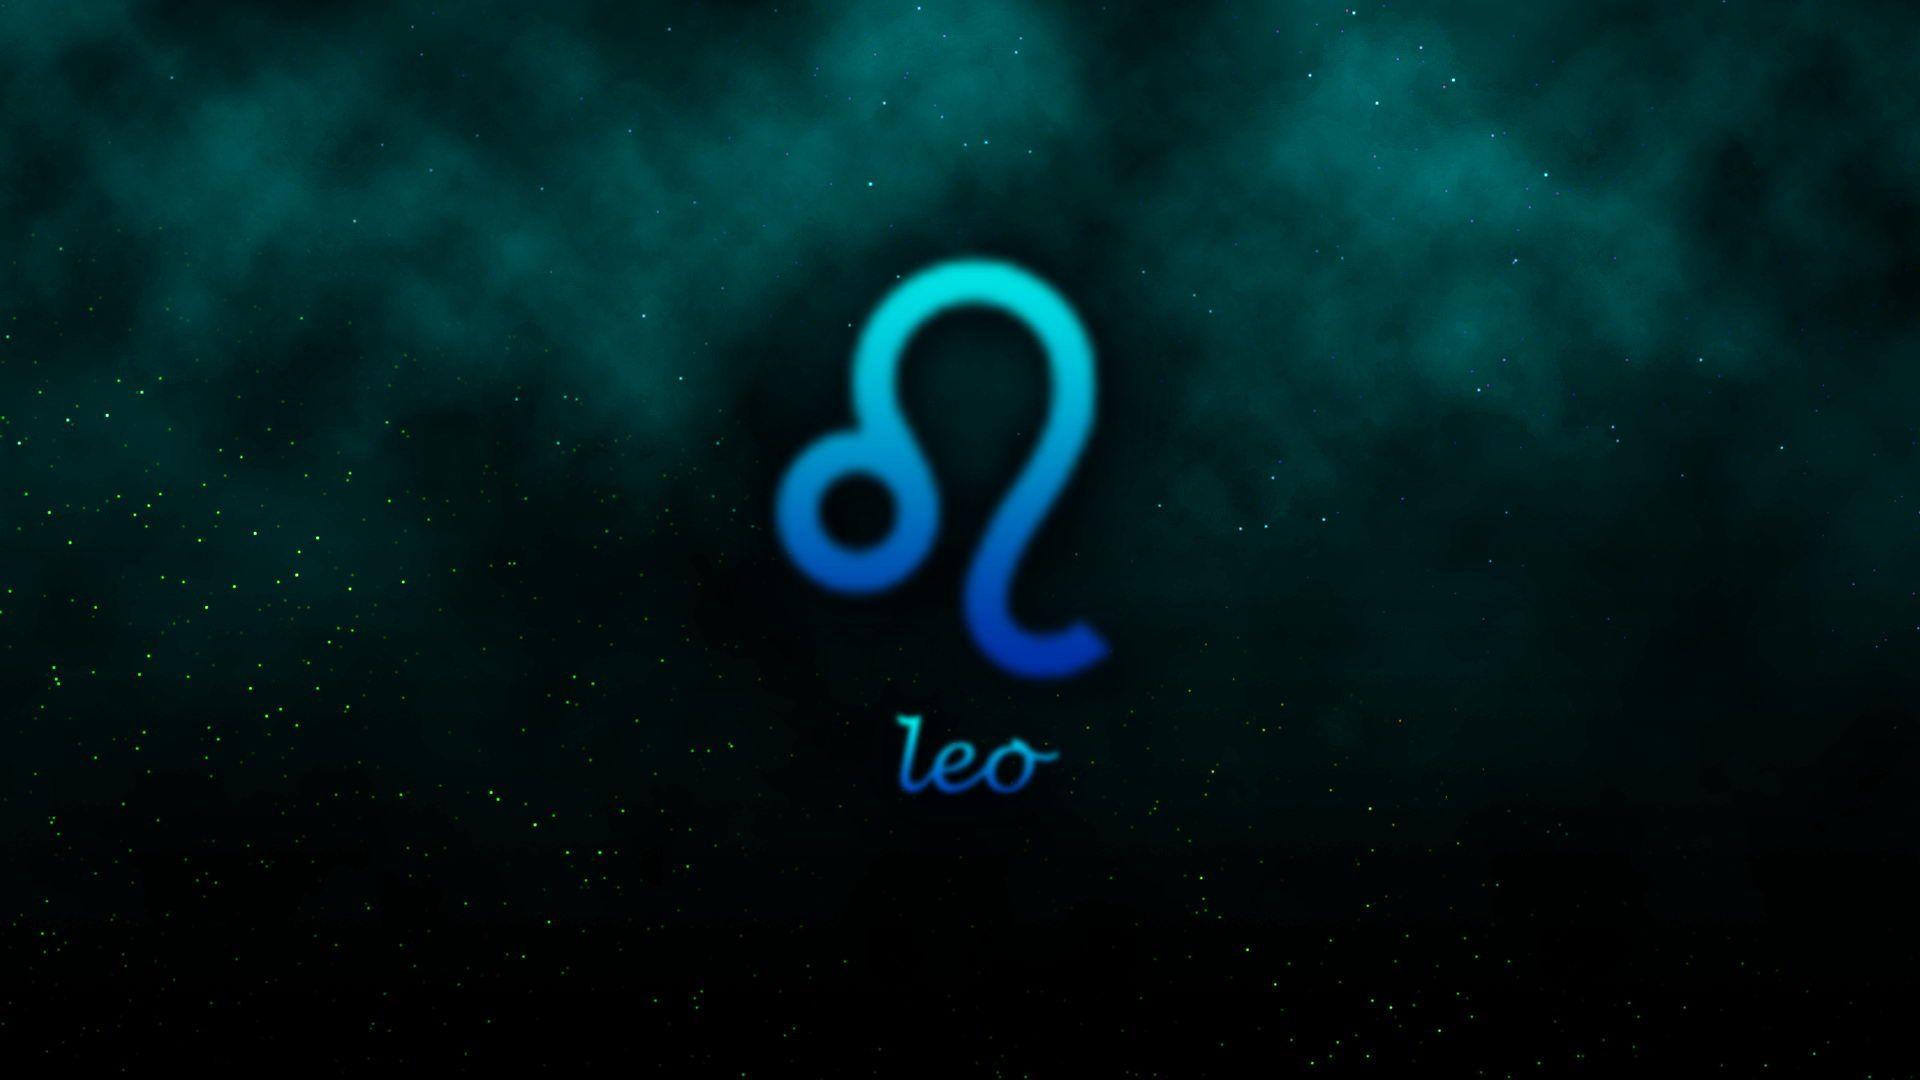 Leo Zodiac Sign Wallpaper 61297 1920x1080 Px